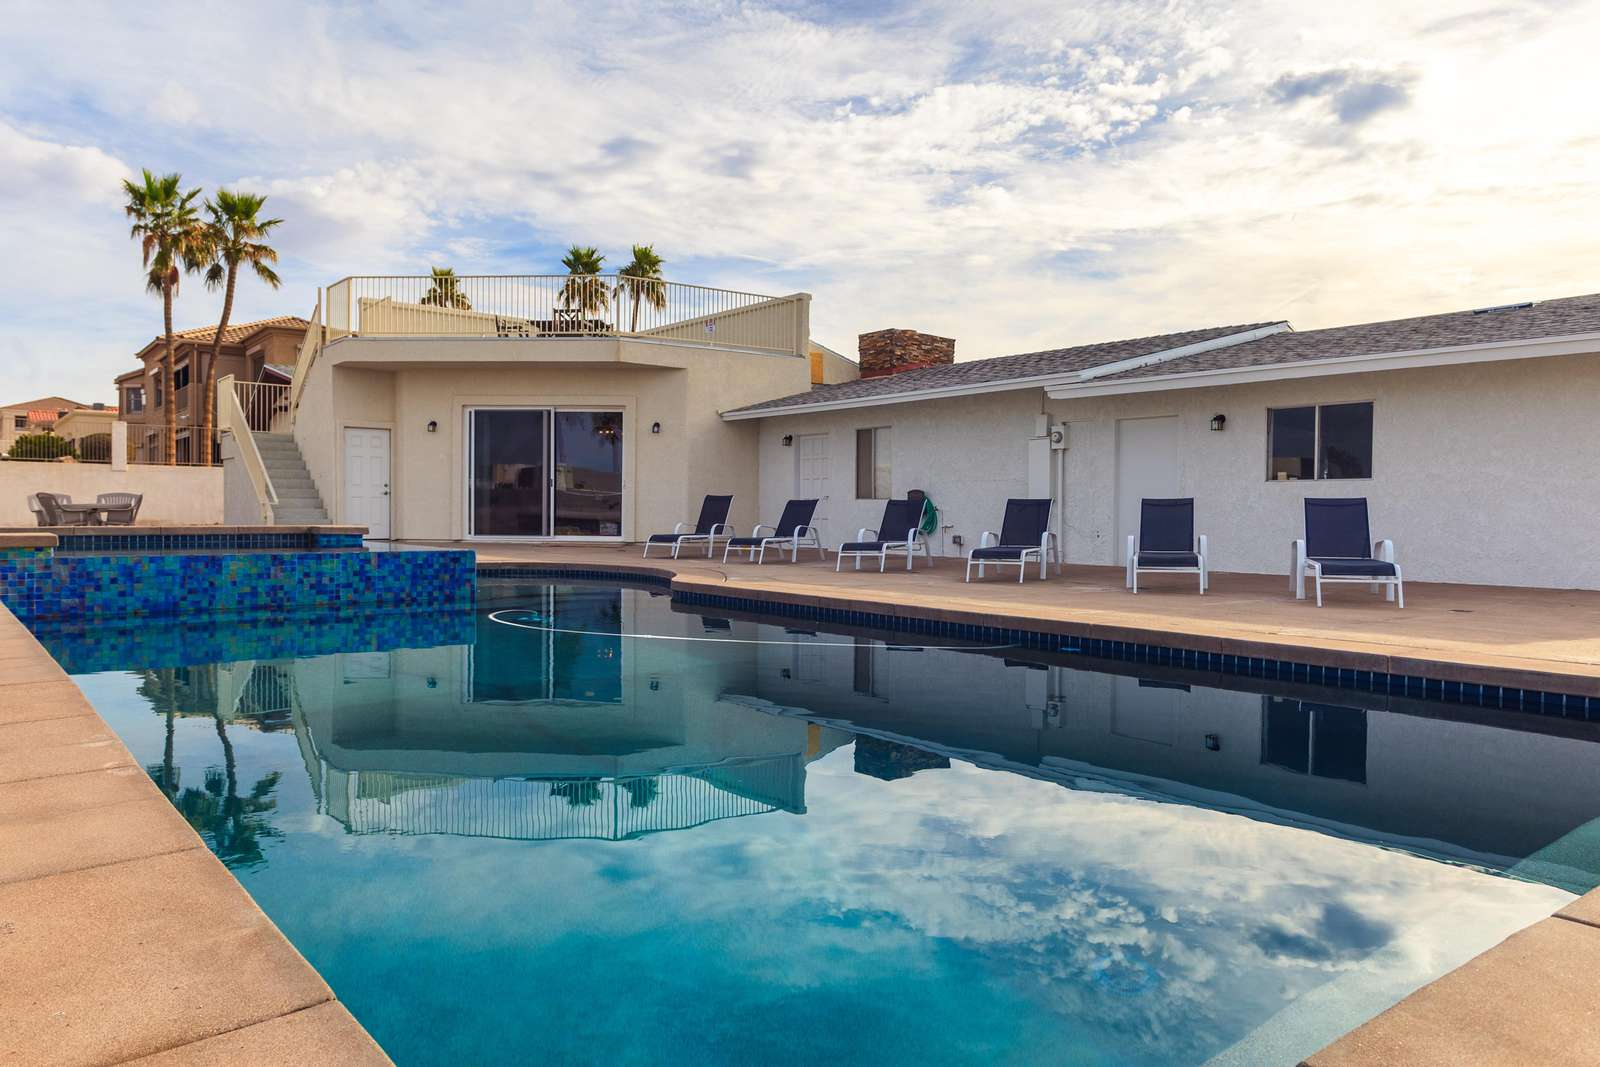 Custom Heated Pool and Spa - property